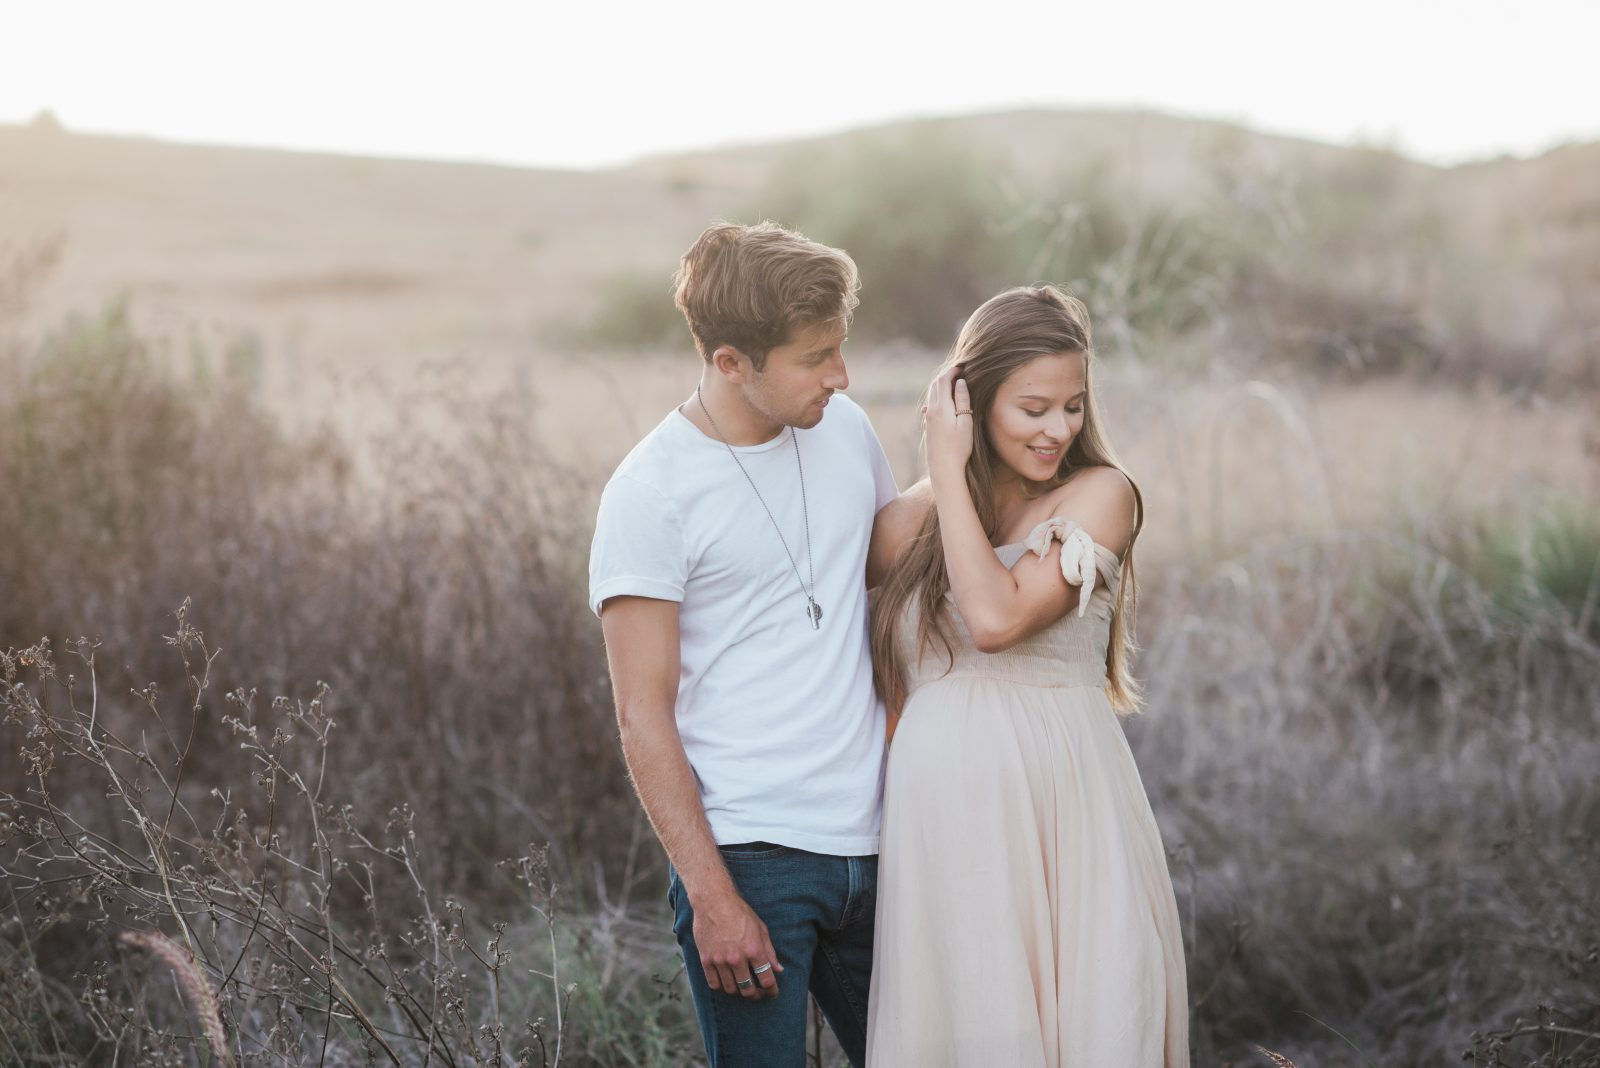 Outdoor Maternity Photography | Orange County Maternity Photographer